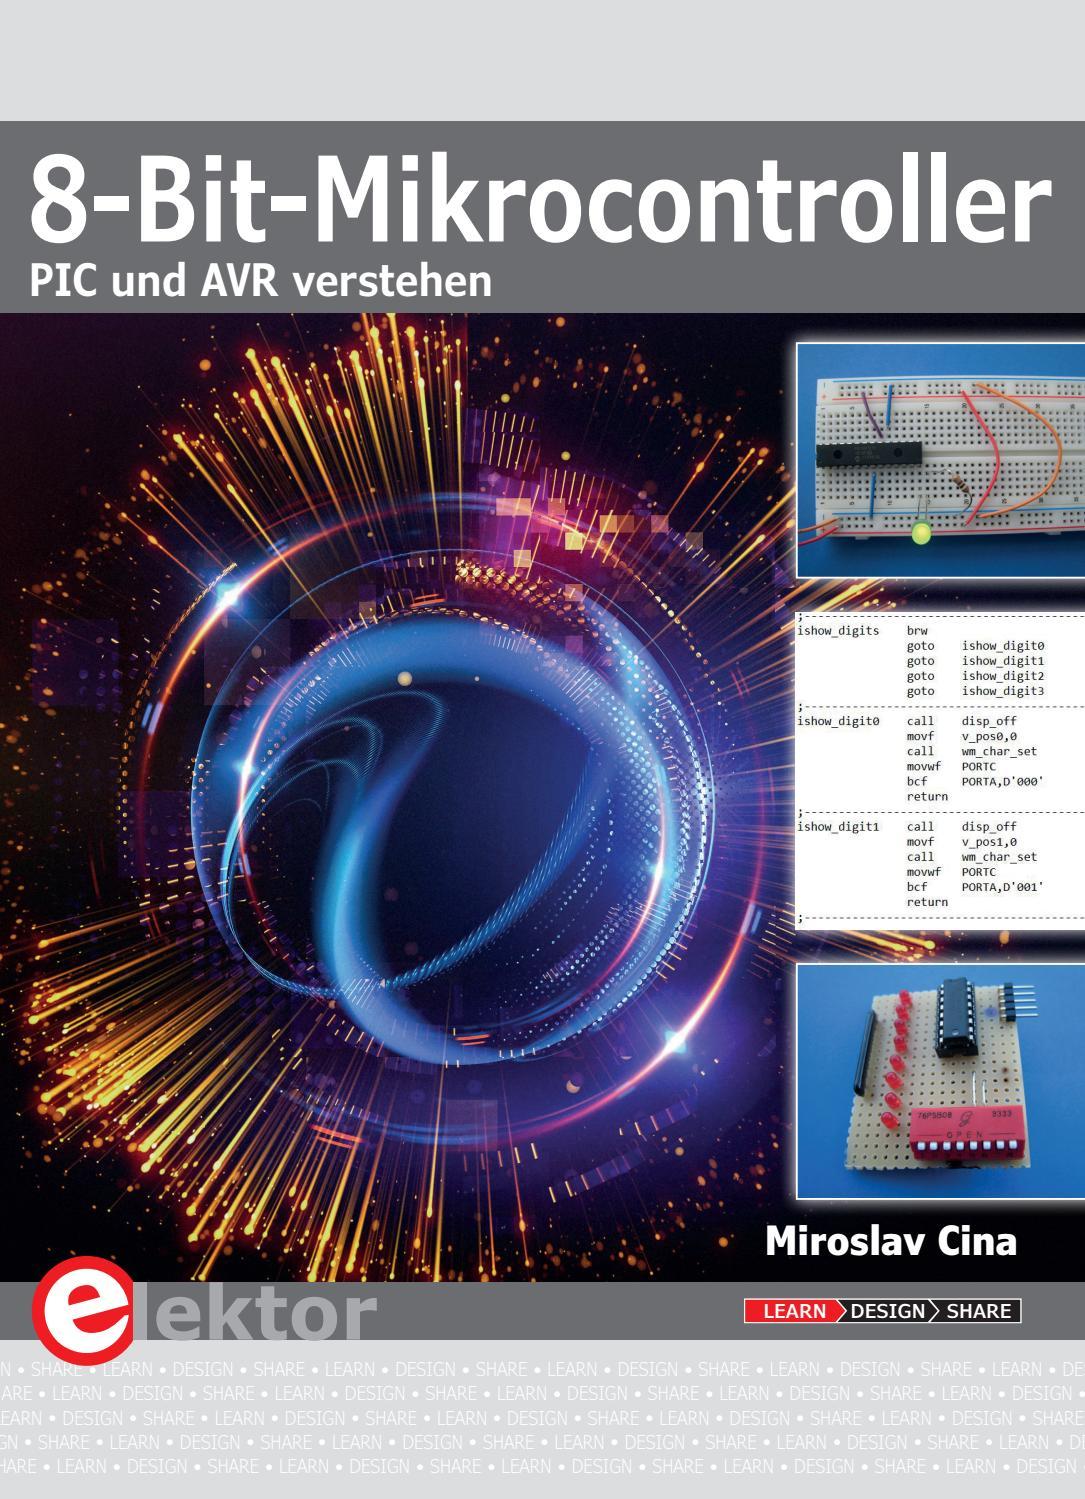 8 Bit Mikrocontroller Leseprobe by Elektor issuu